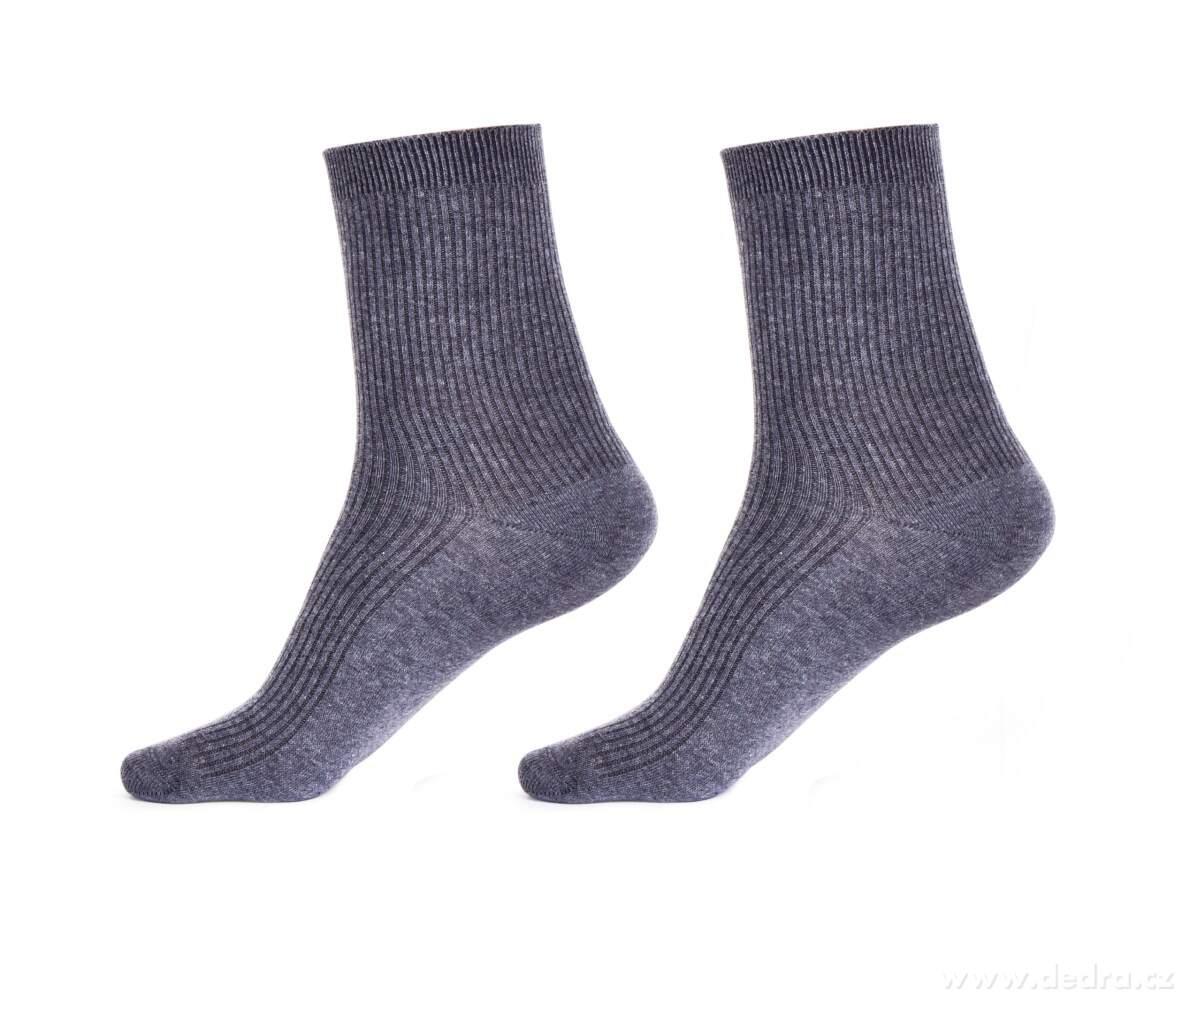 Komfortné zdravotné ponožky